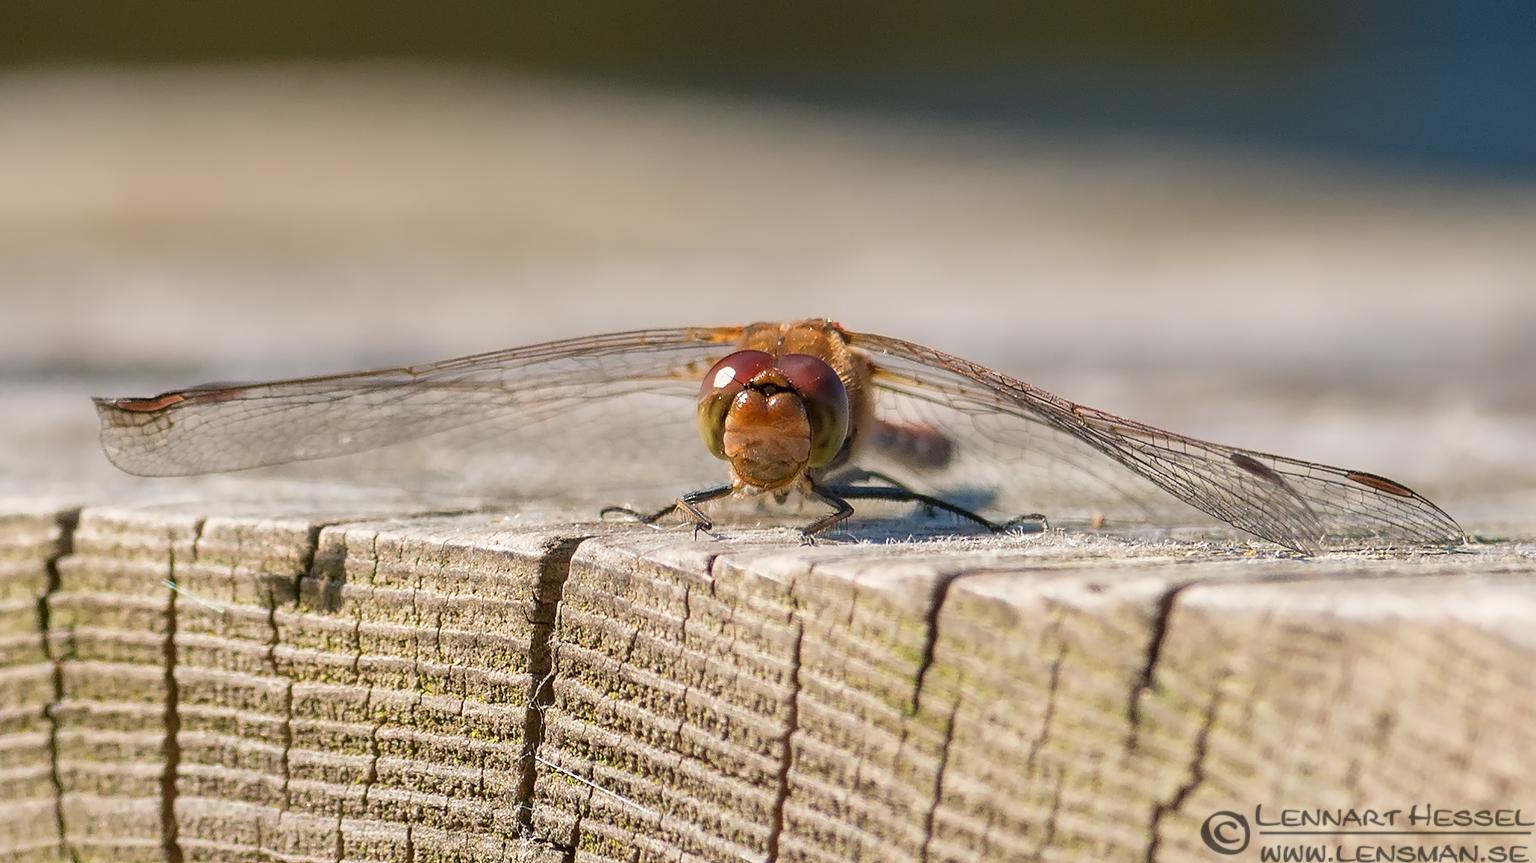 Dragonfly on a bench Öland 2012